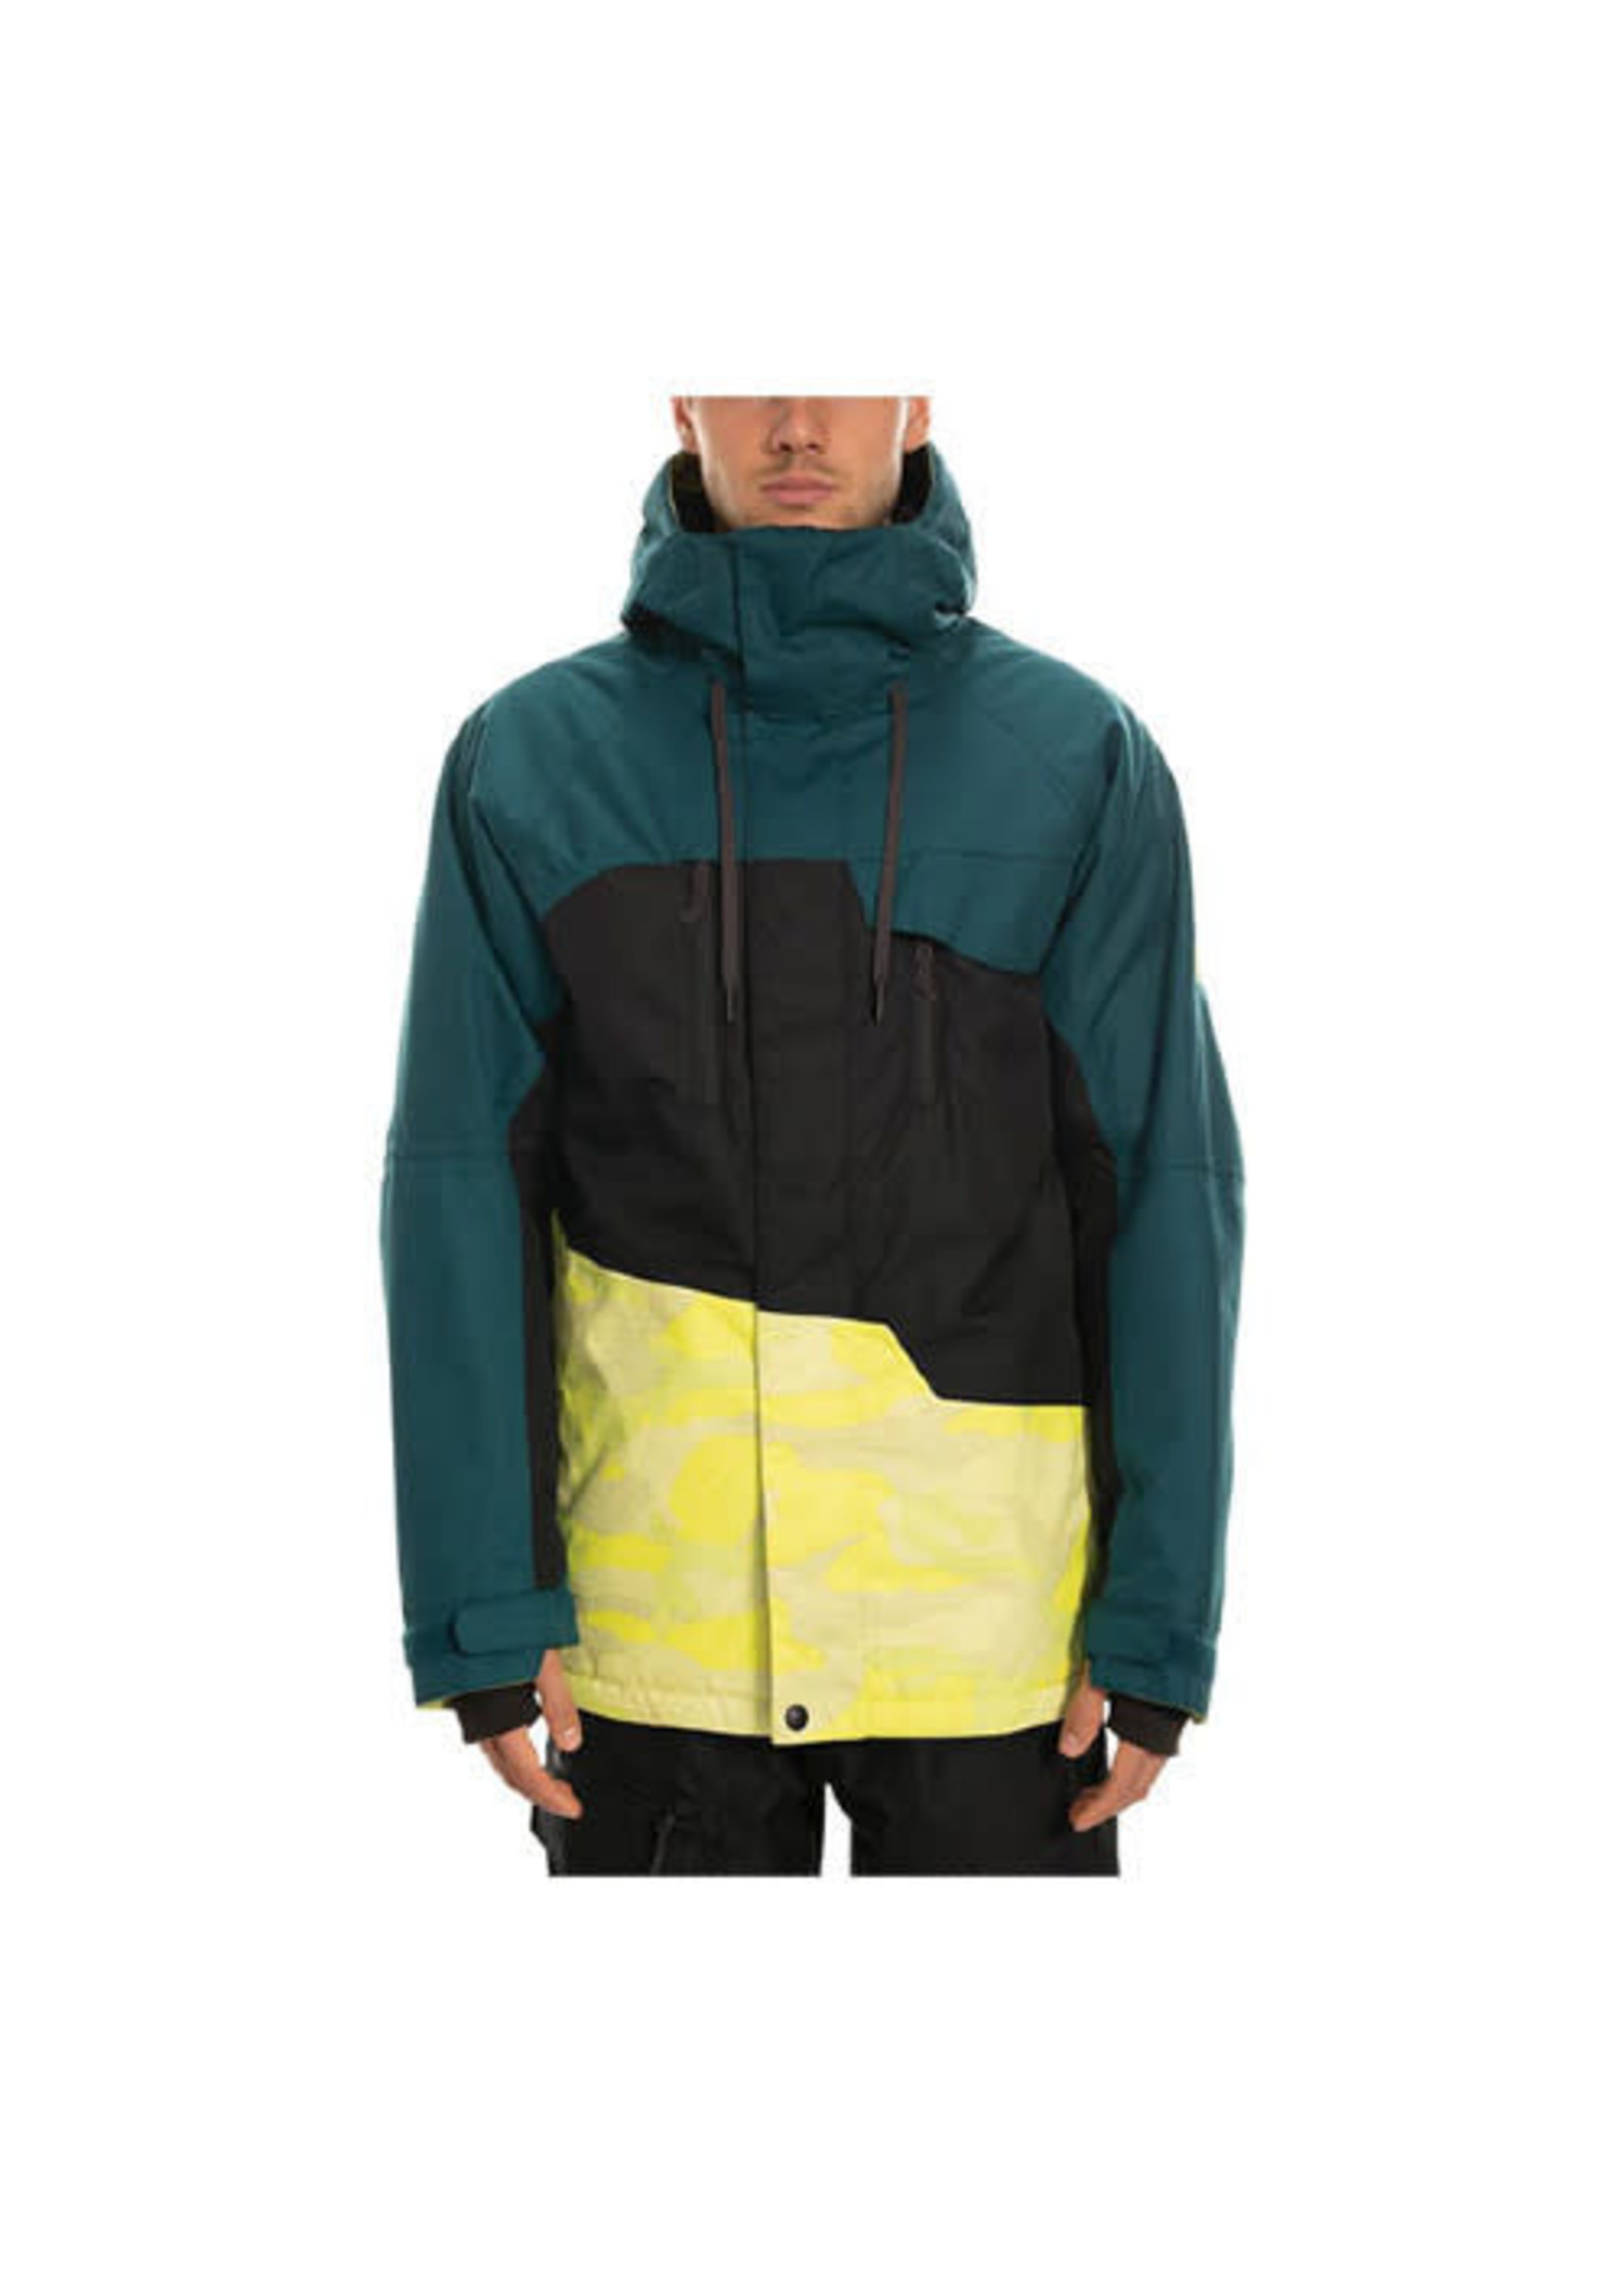 686 686 Geo Insulated Jacket 2020